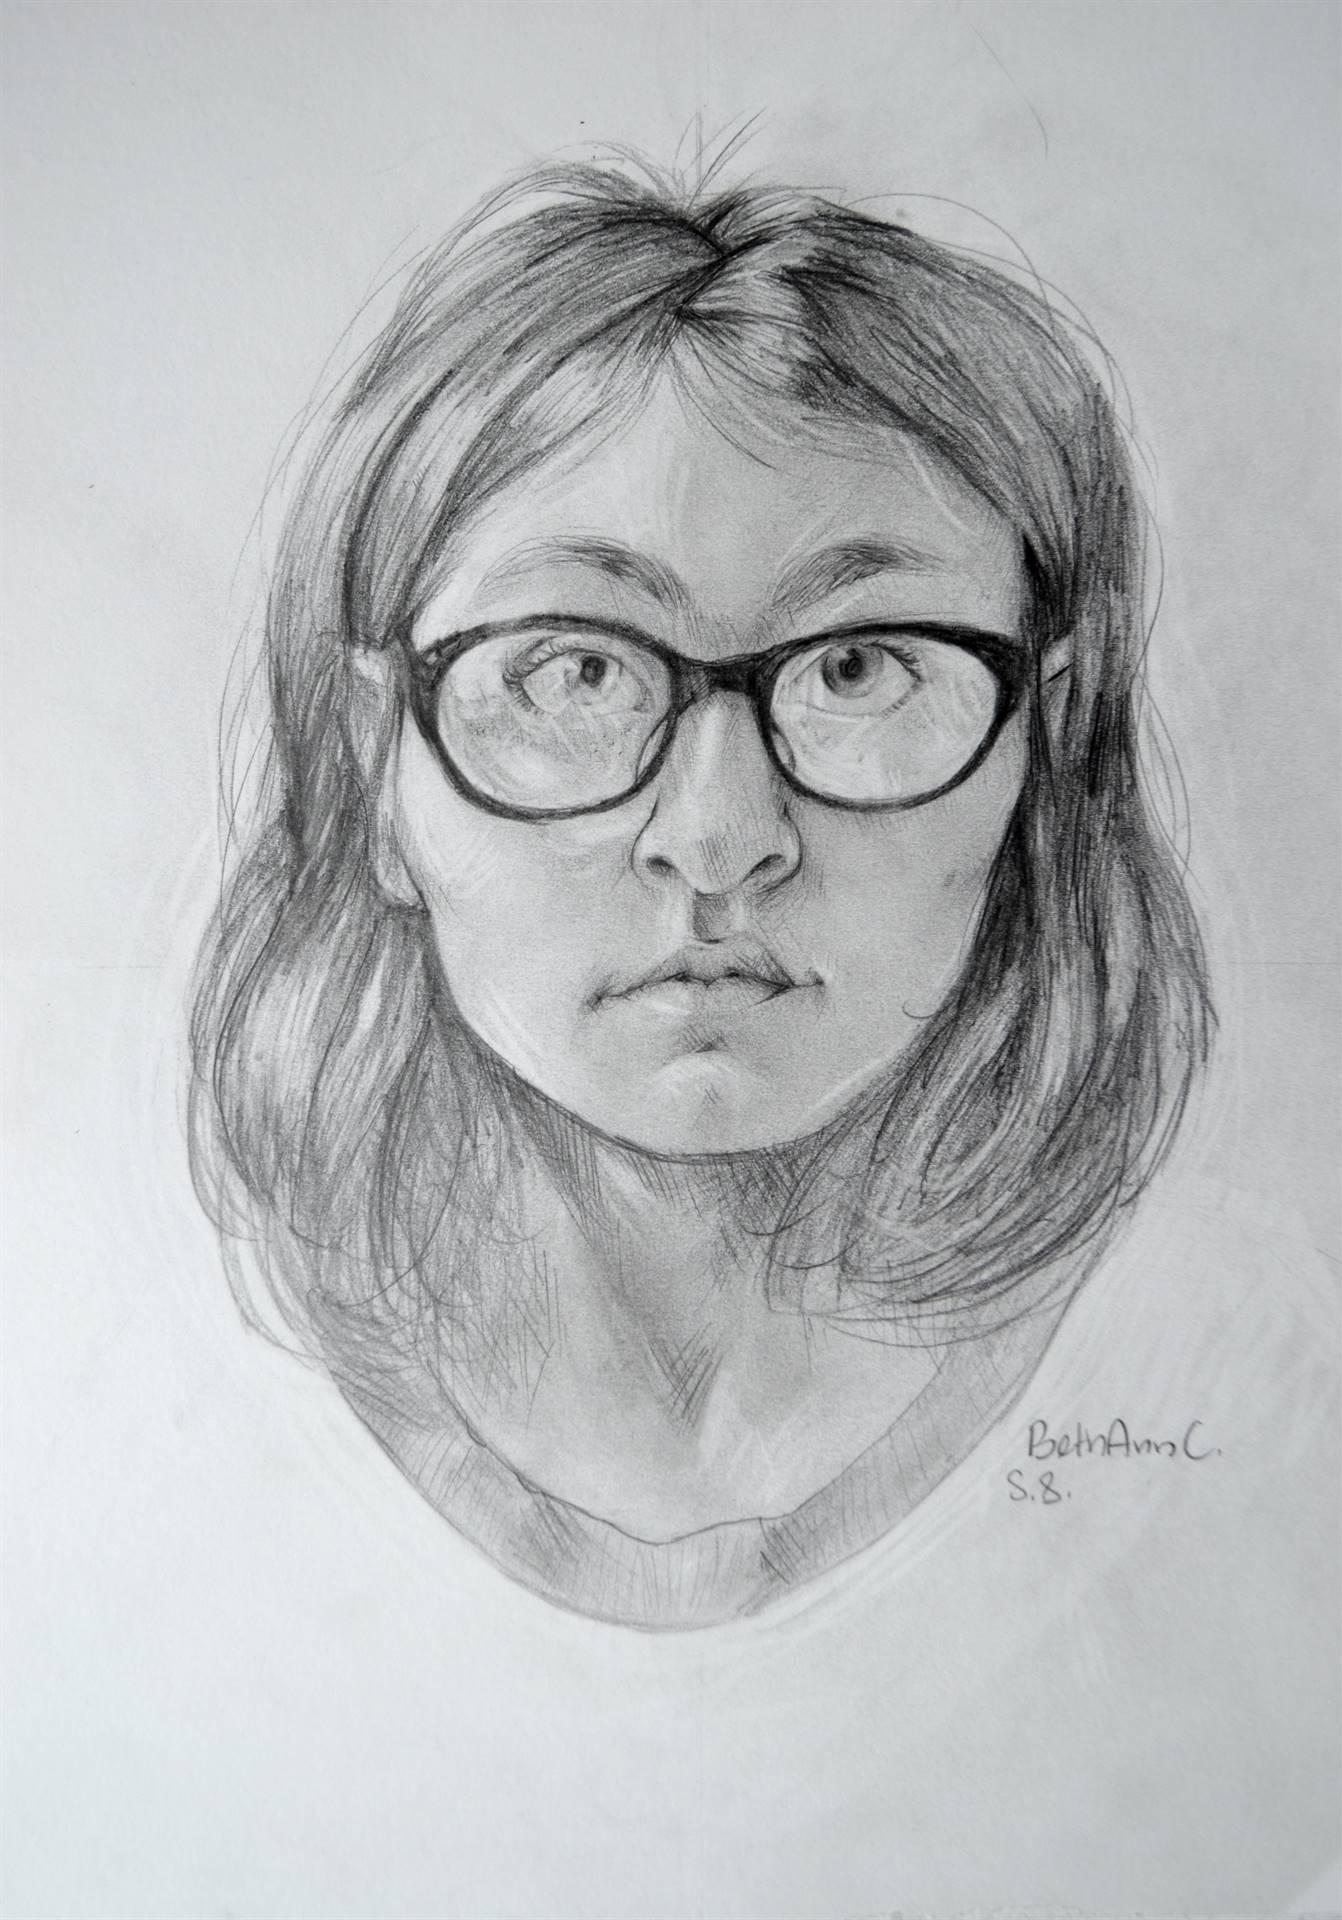 Bethann Cristantiello, Self-Portrait, graphite, 14 x 11, 2017